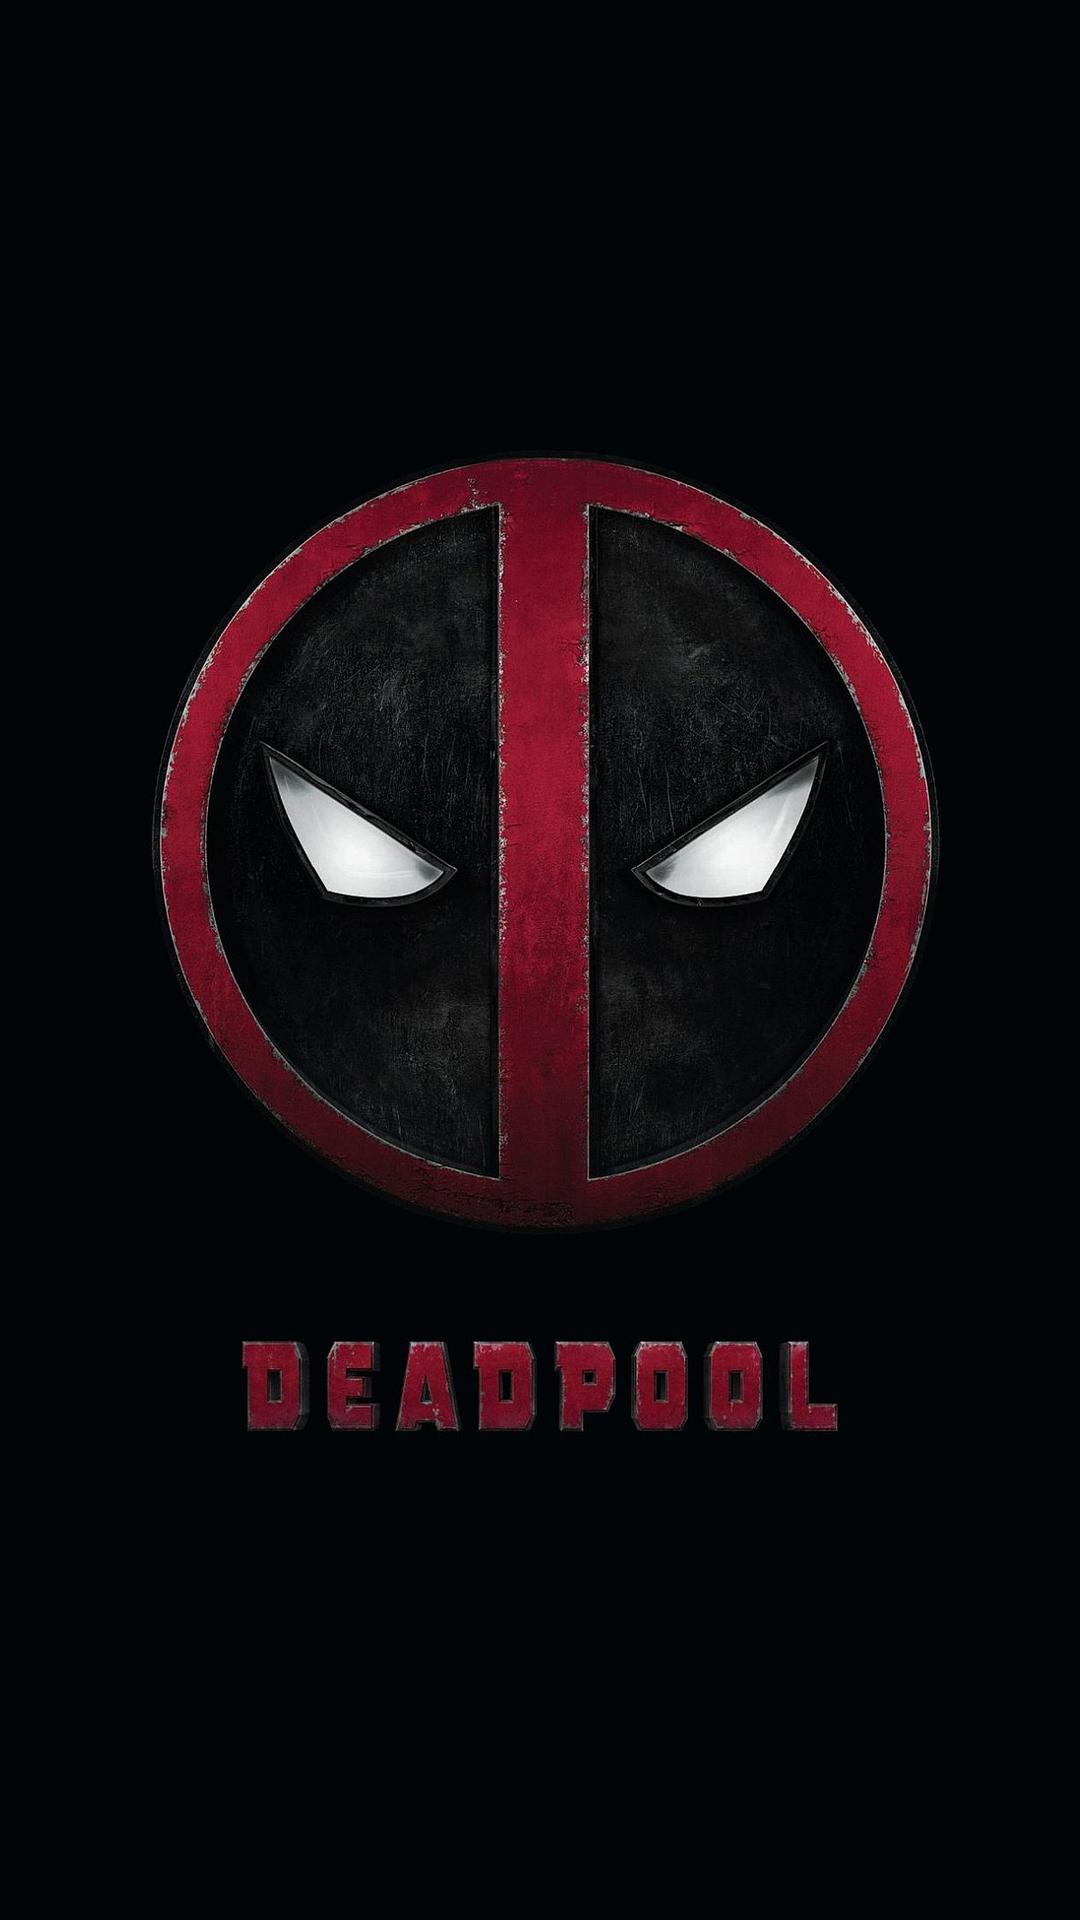 Godfather Wallpaper Iphone X Deadpool Logo Iphone Wallpaper Hd